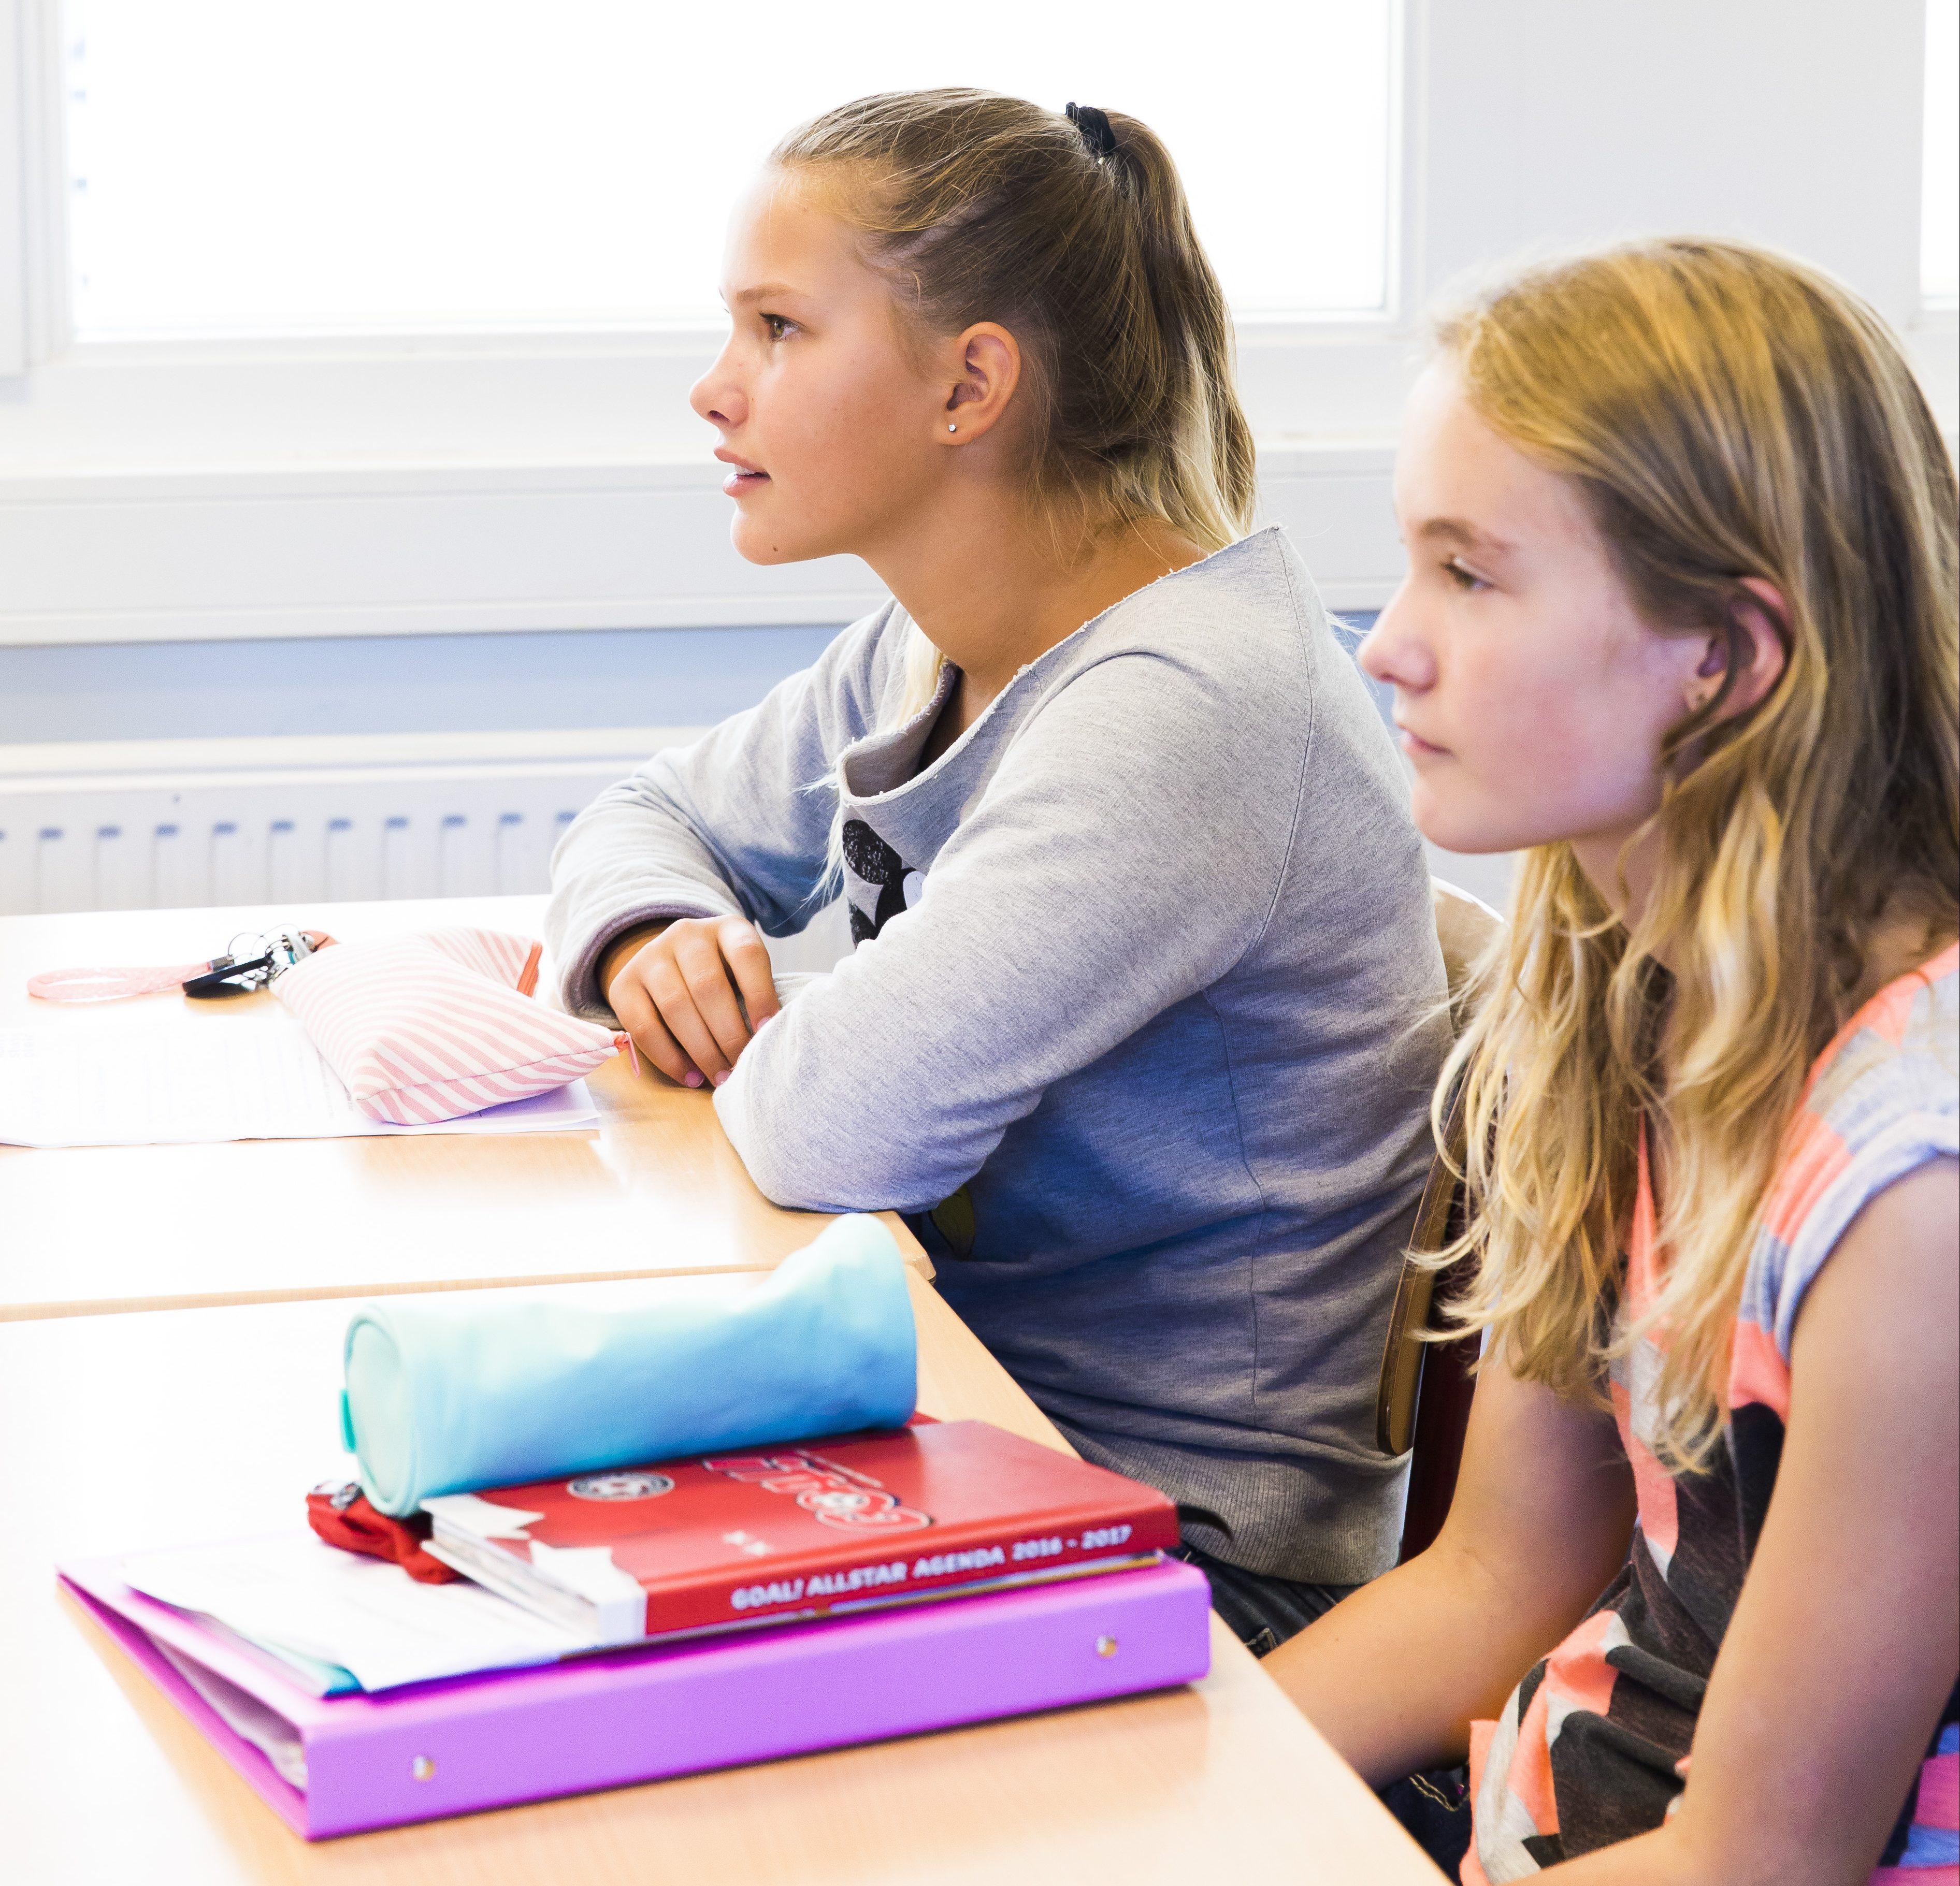 Haemstede-Barger-Mavo-HBM-middelbare-school-Heemstede-leerlingen-in-de-klas